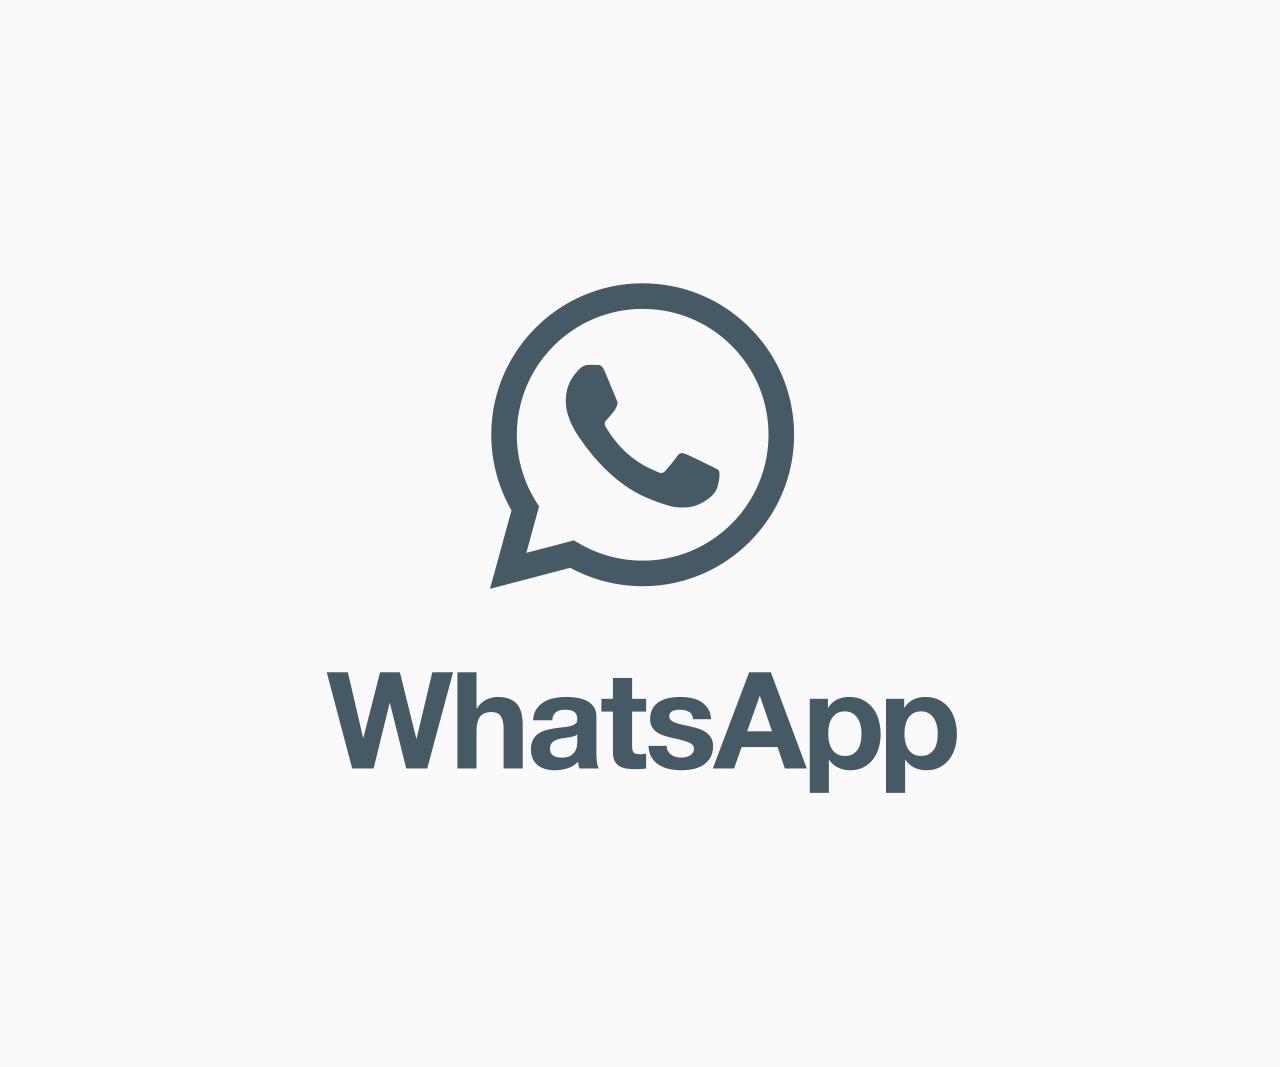 whatsapp business download link